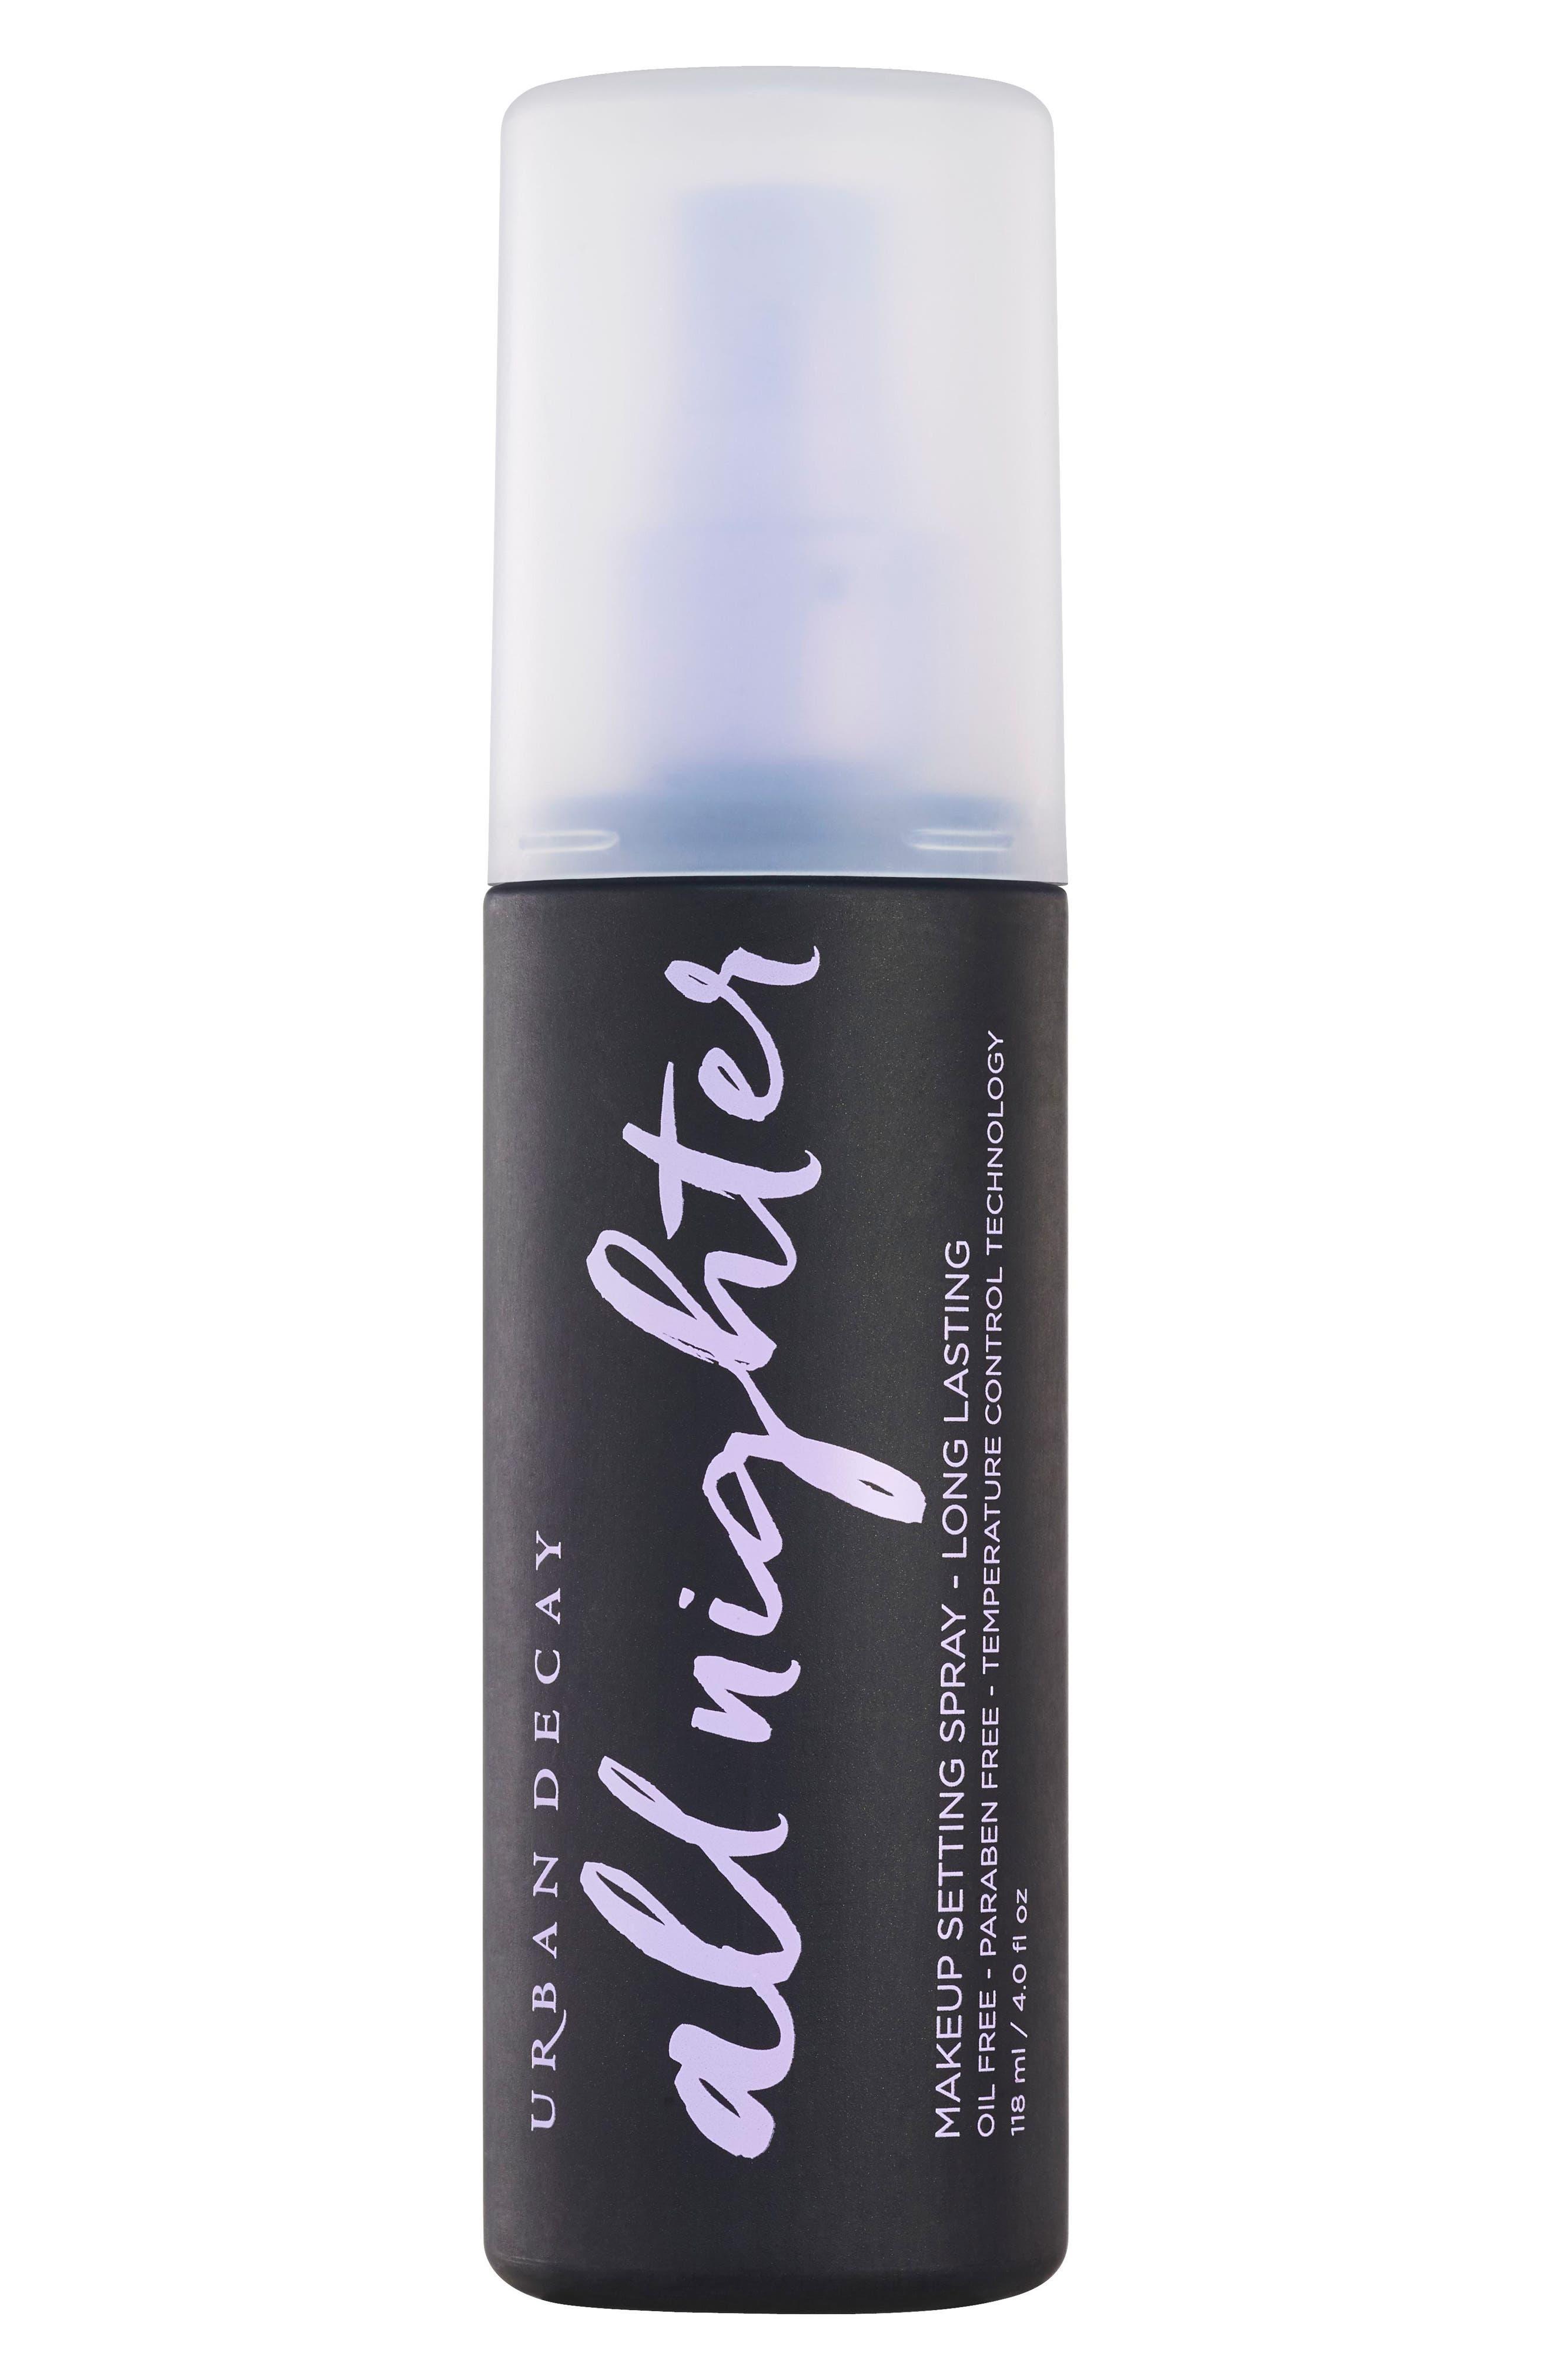 Main Image - Urban Decay All Nighter Long-Lasting Makeup Setting Spray